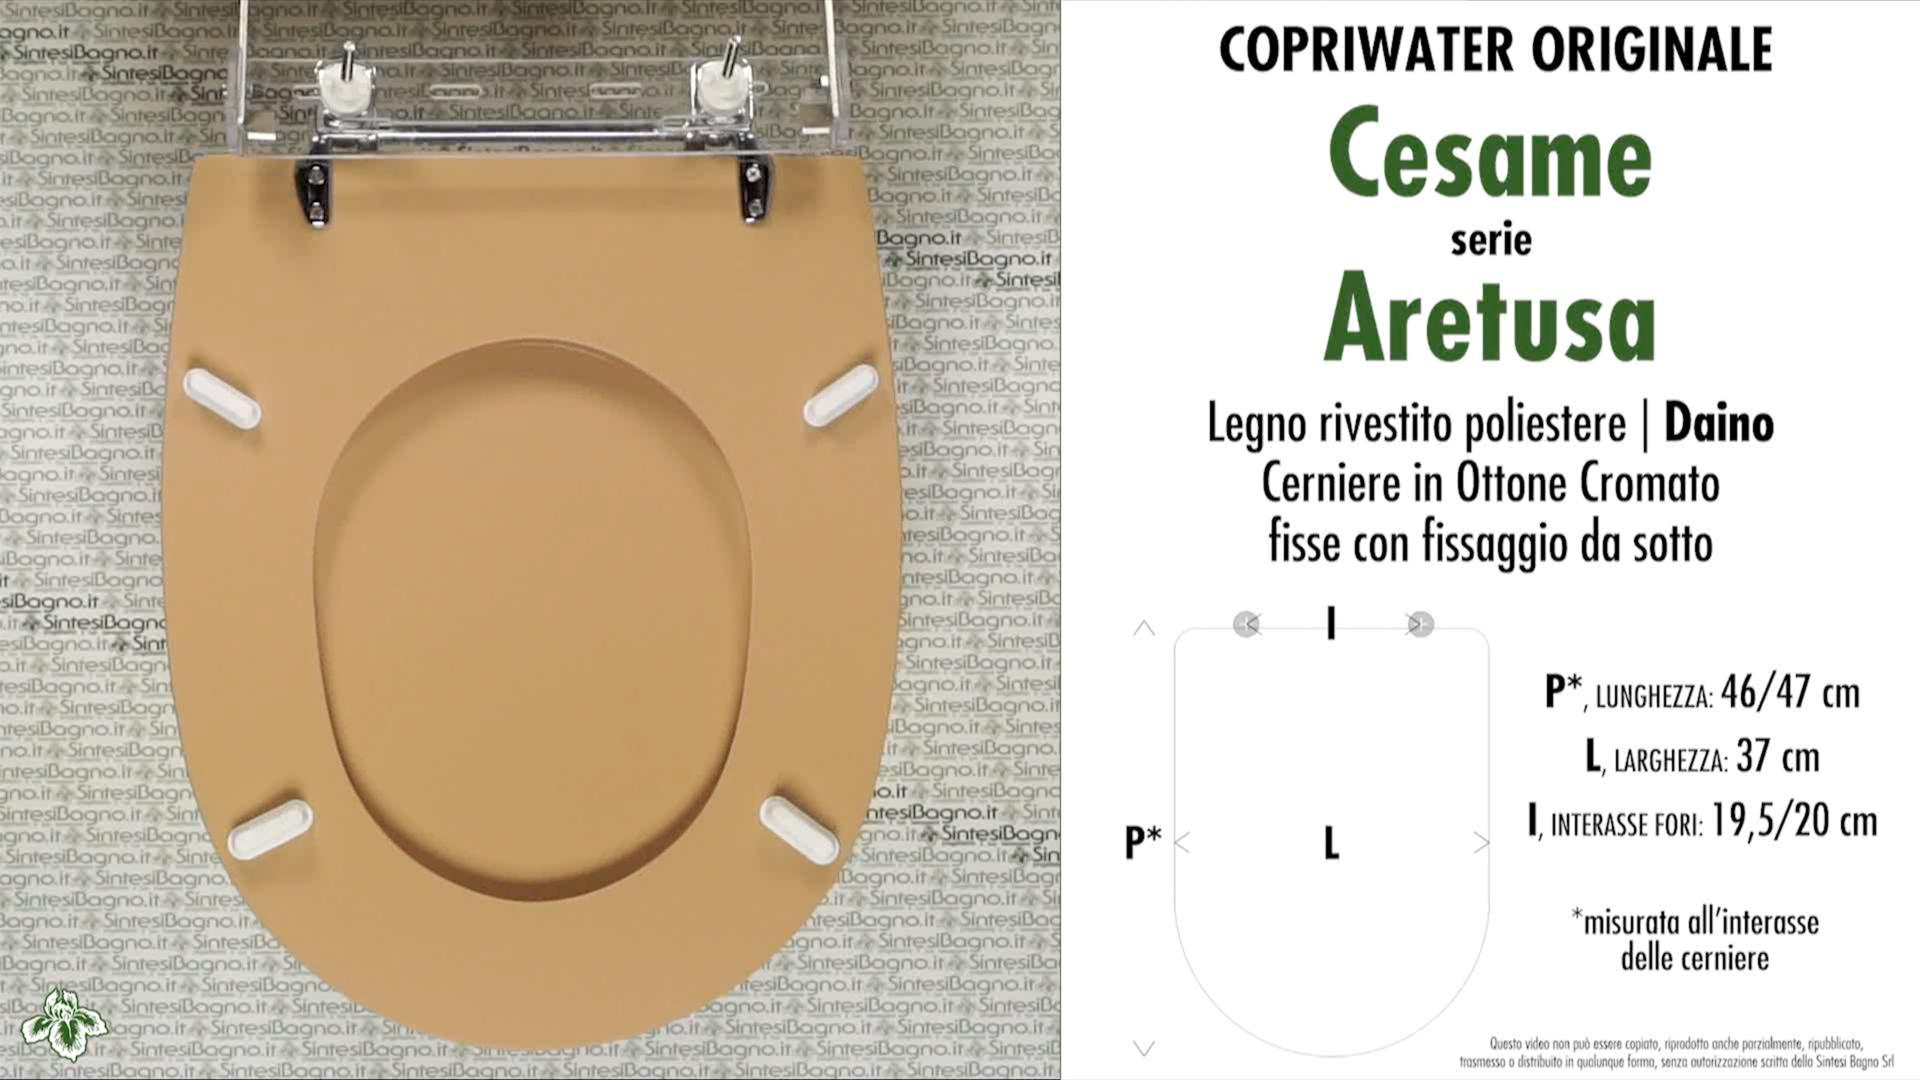 SCHEDA TECNICA MISURE copriwater CESAME ARETUSA